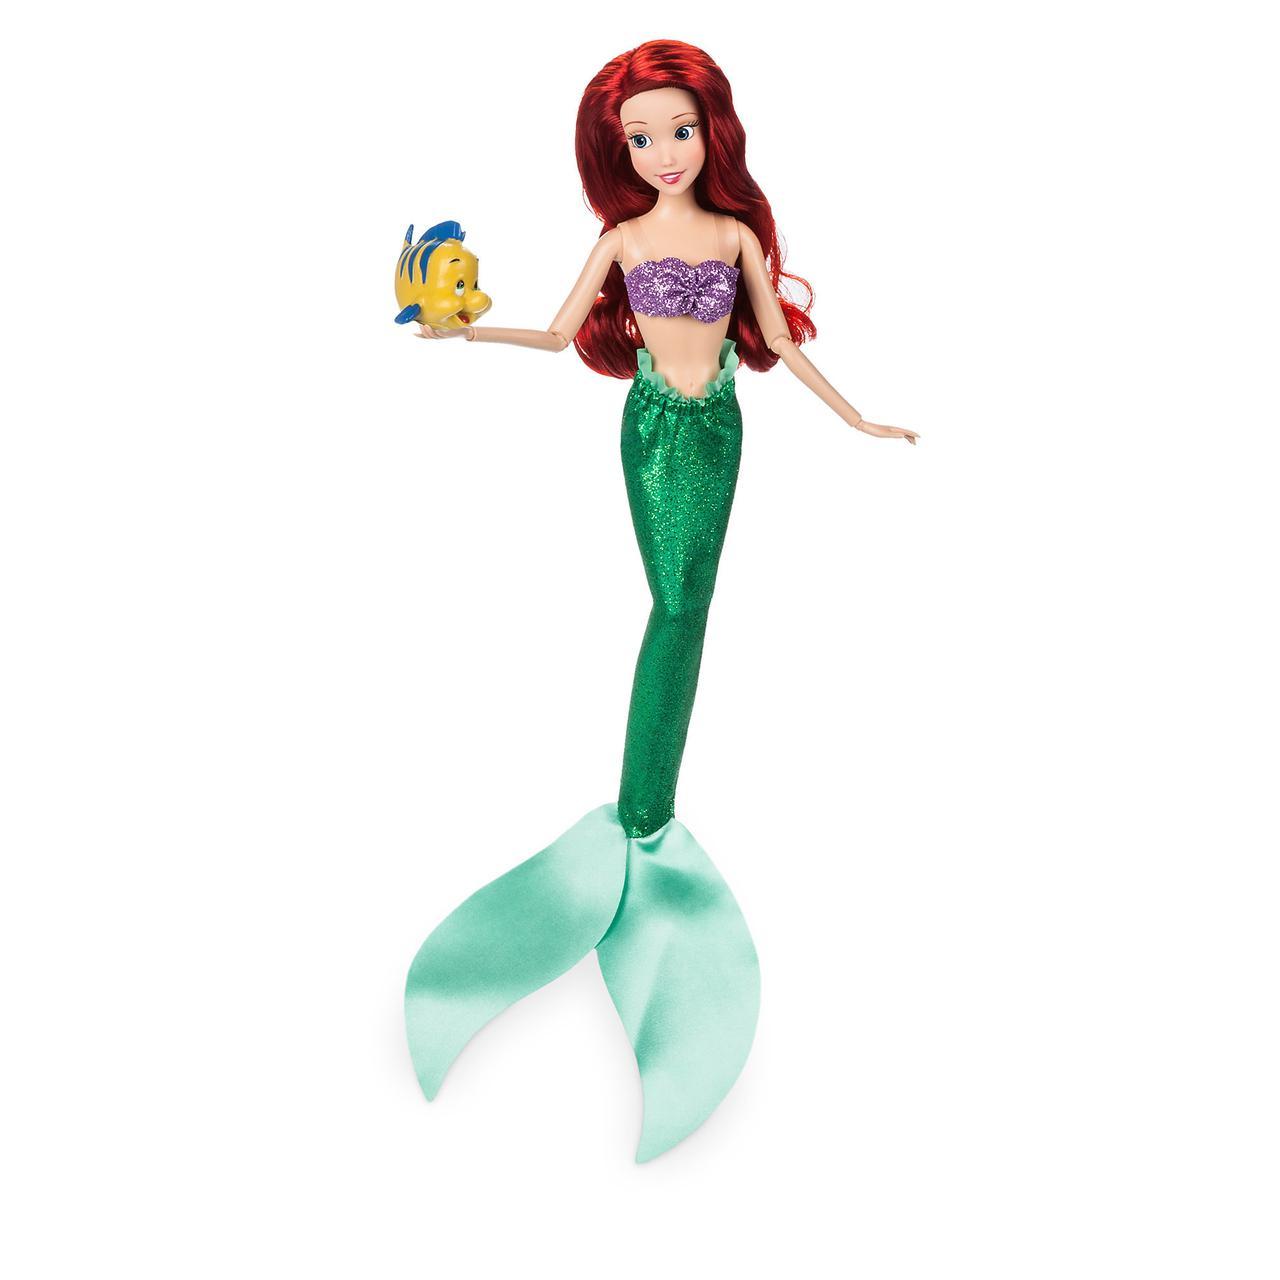 Ariel Classic Doll with Flounder Figure (Классическая кукла Ариэль и фигурка Флаундер)